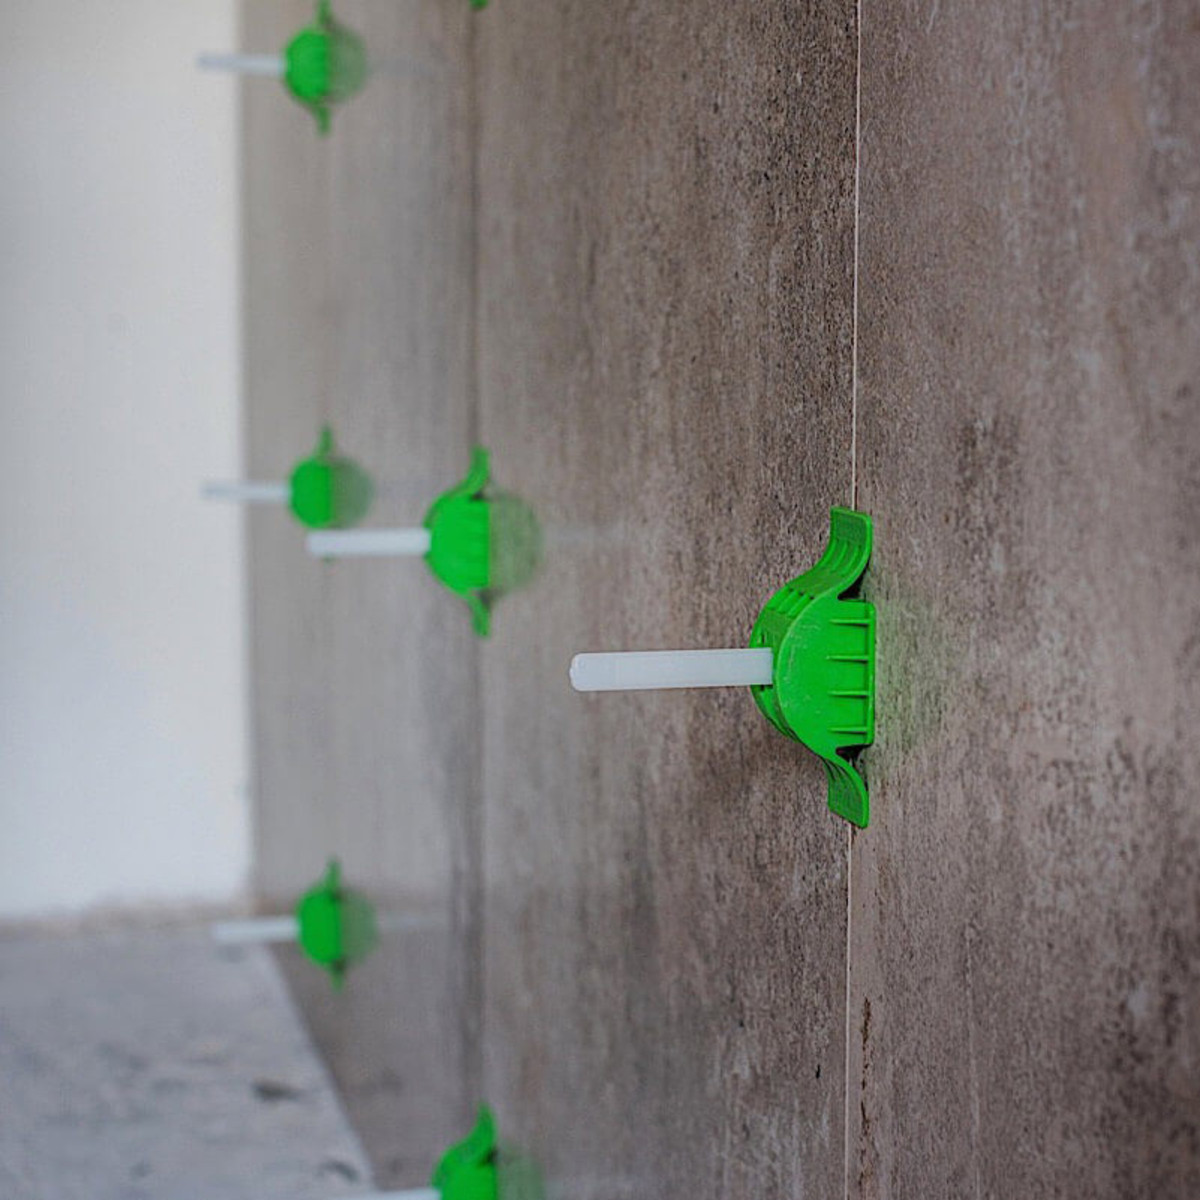 mlt t1 straps wall level bathroom